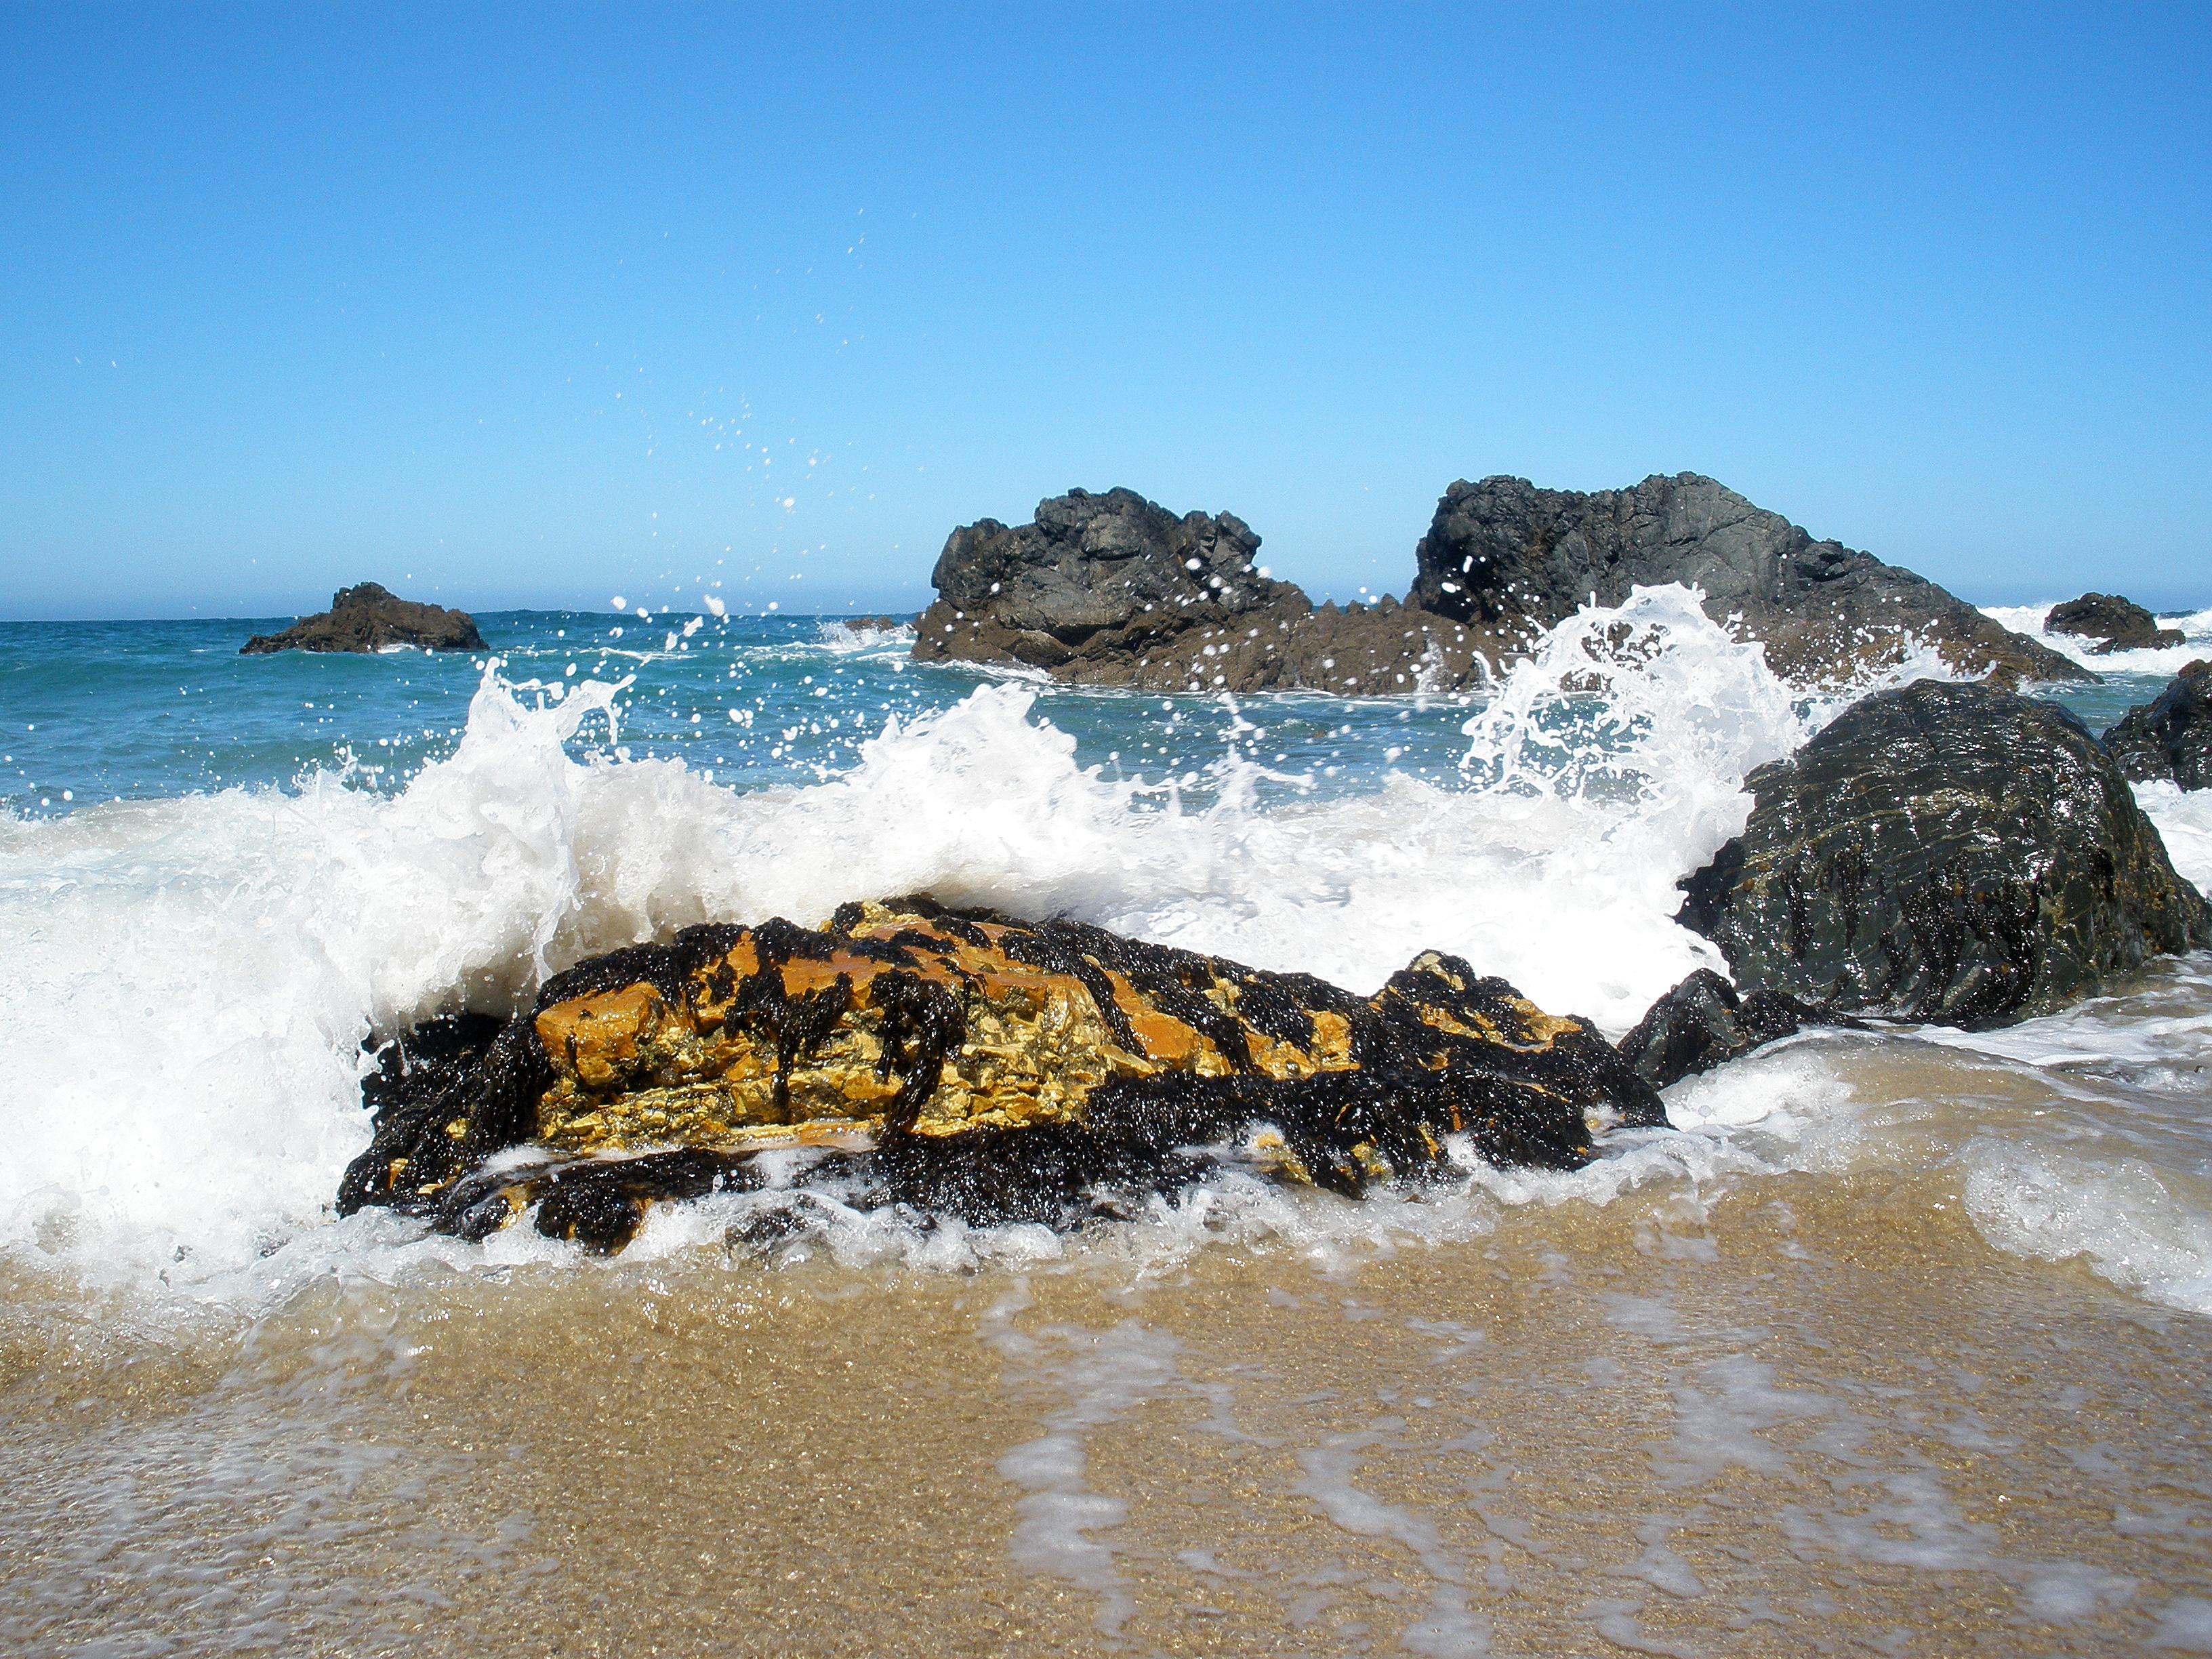 Foto playa Ponzos. Rocas con mucha vida